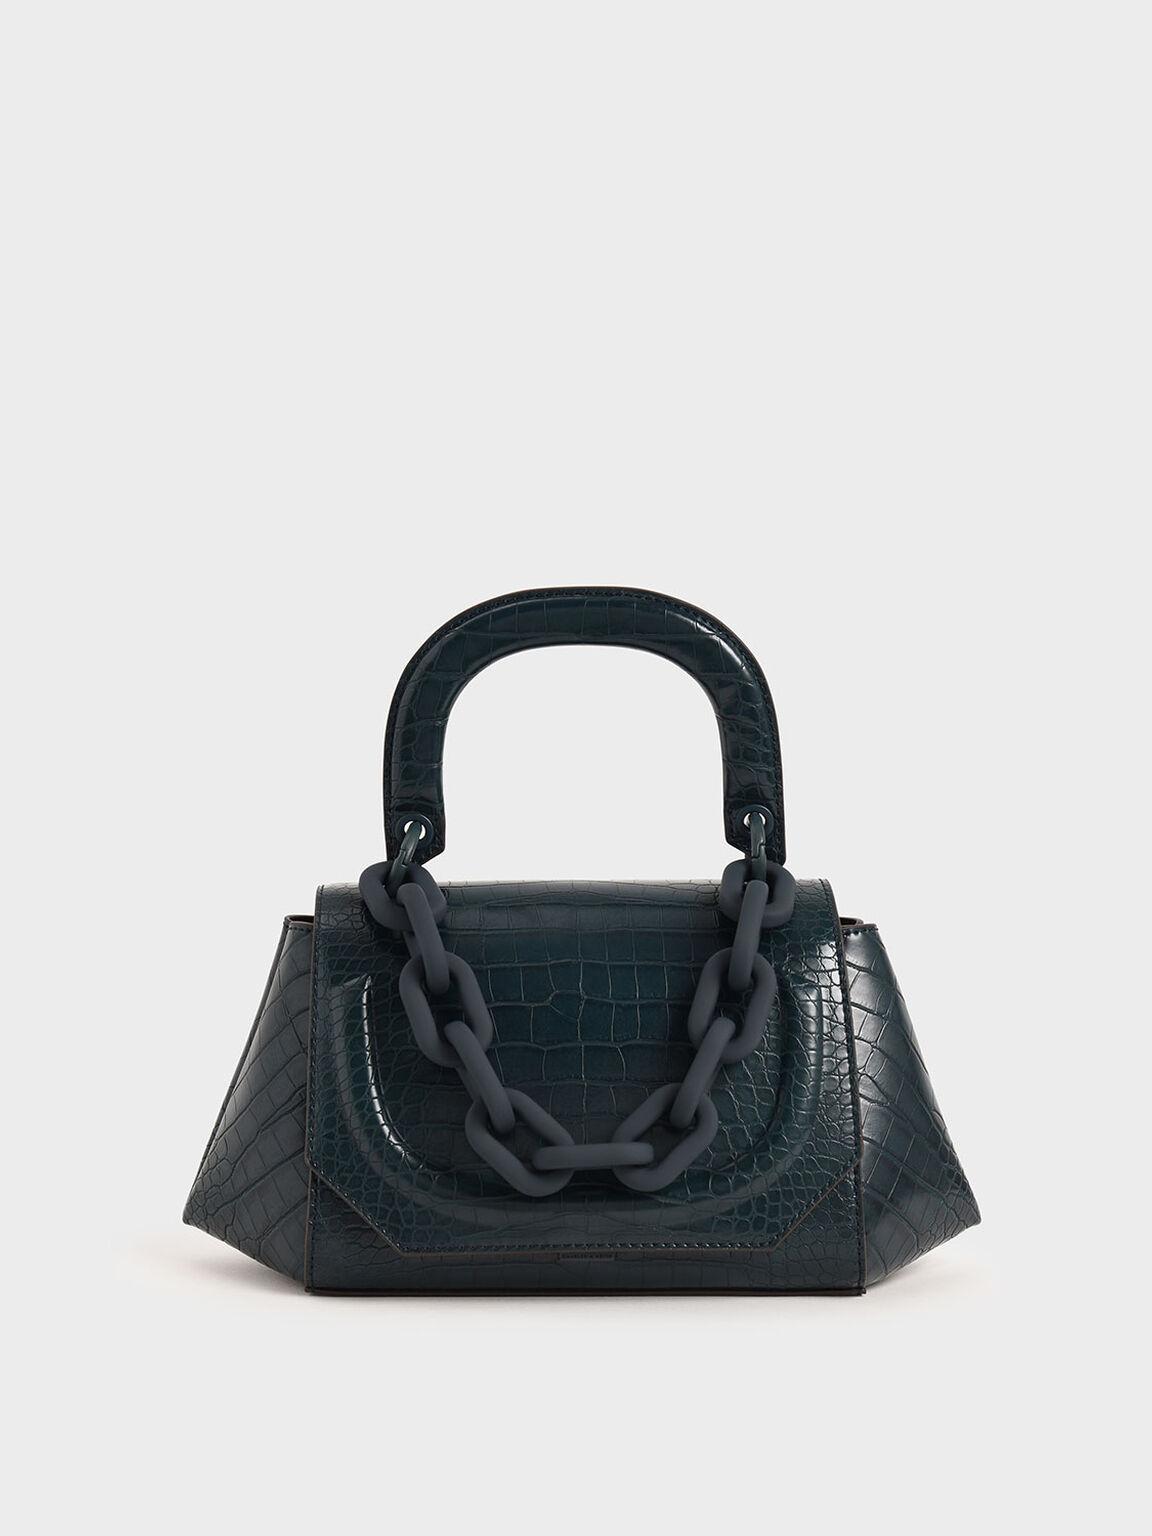 Croc-Effect Chunky Chain Handbag, Teal, hi-res